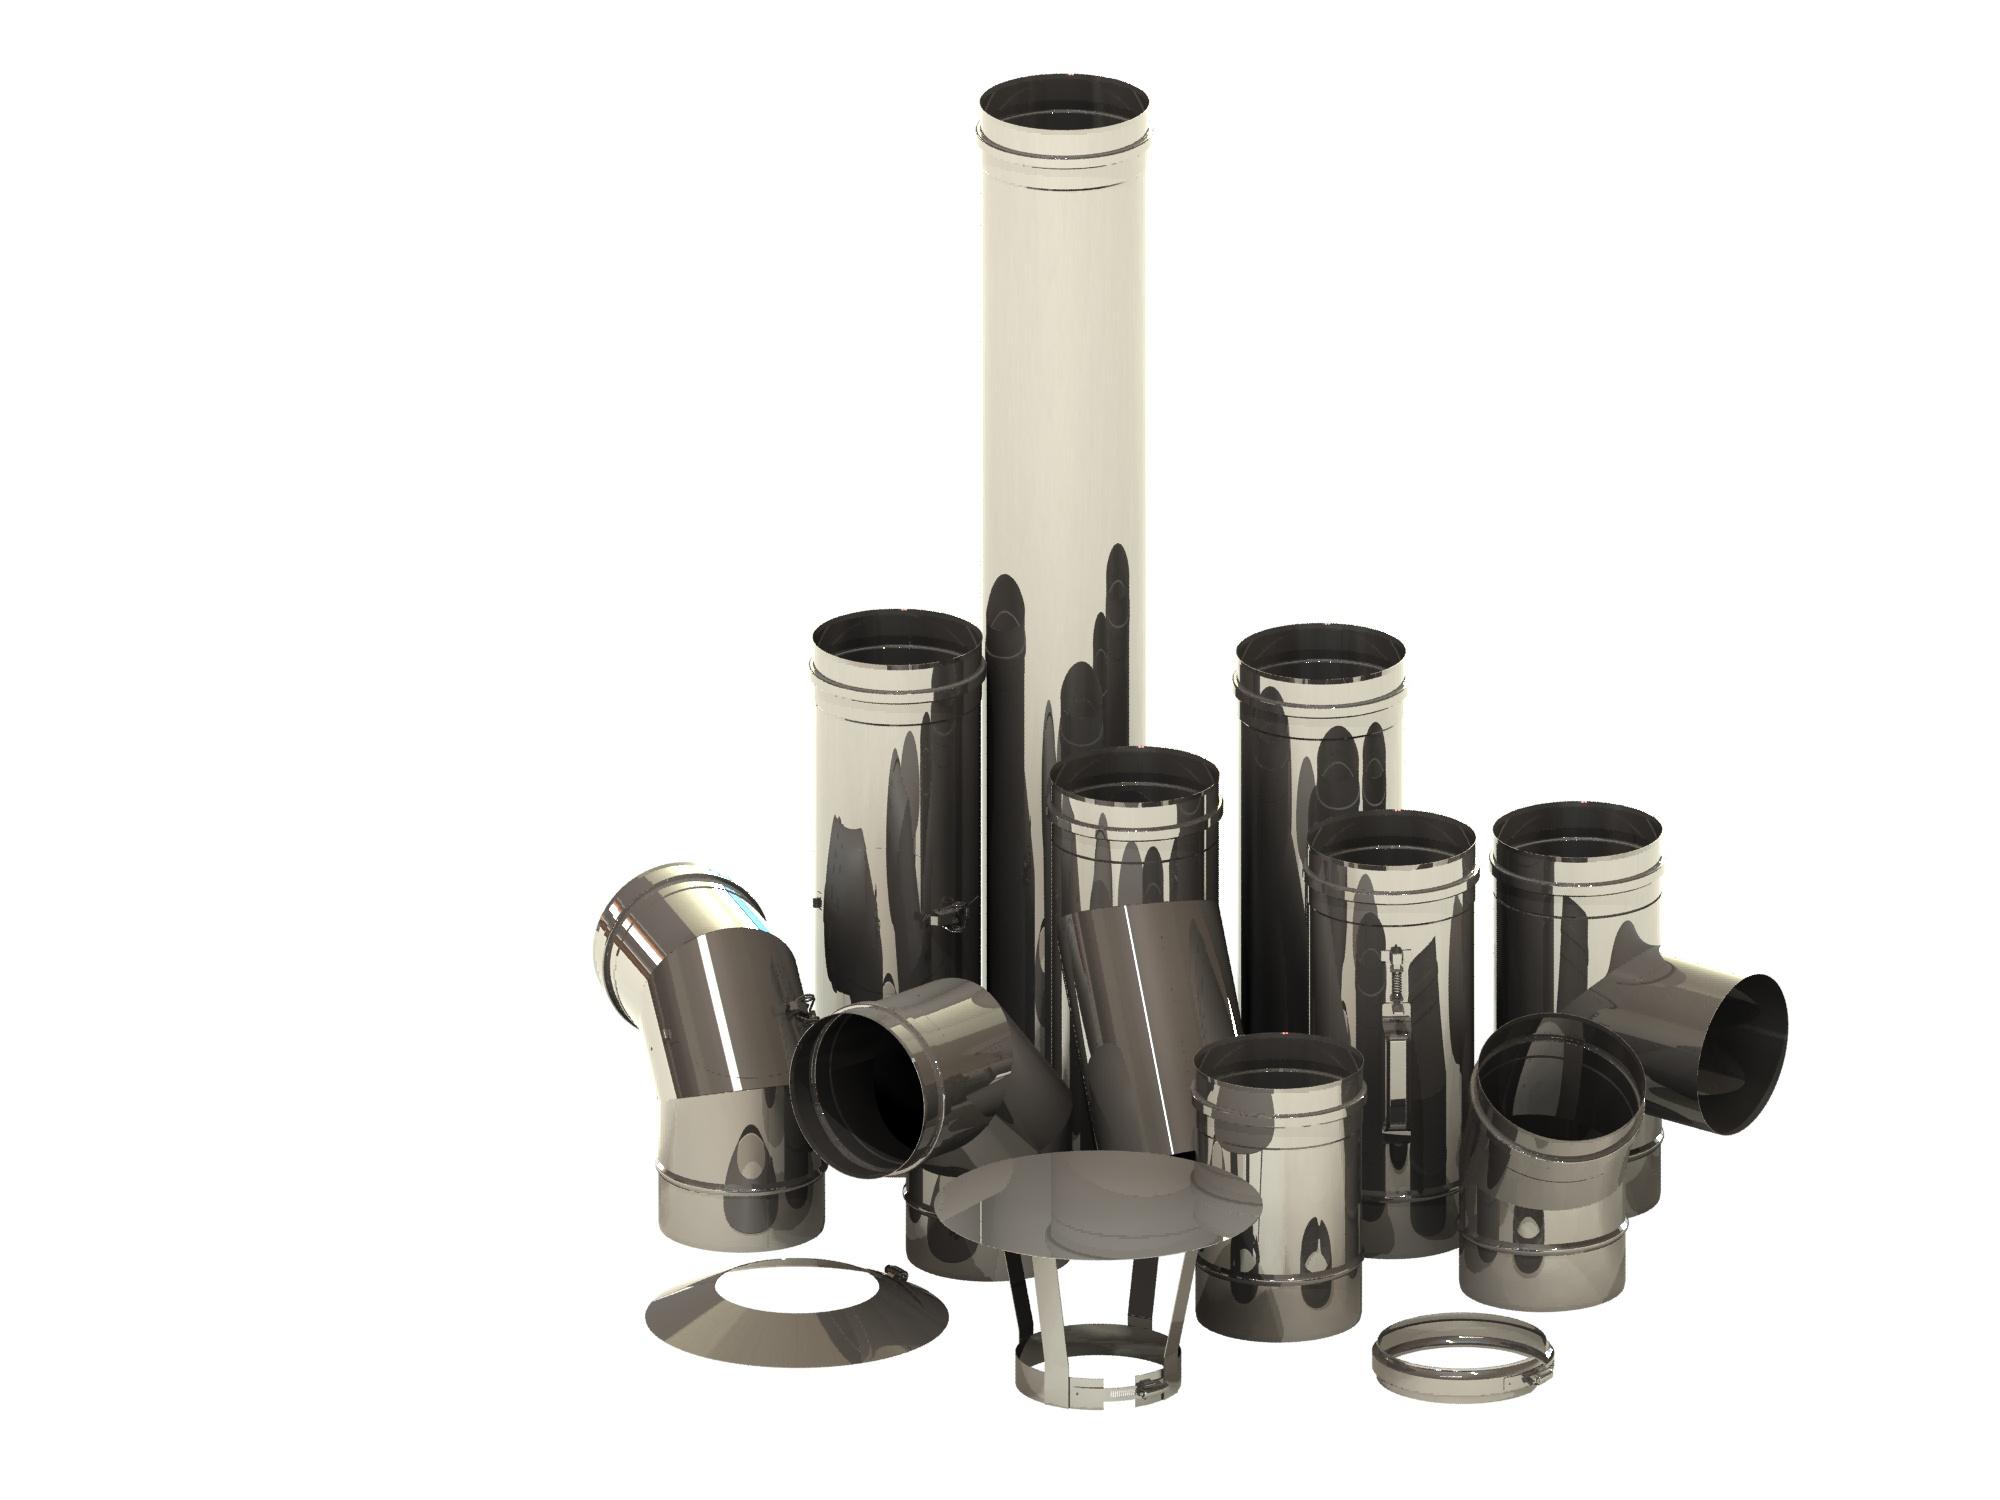 Schornsteinsanierung einwandig Ø 100 mm – Tecnovis TEC-EW-Classic